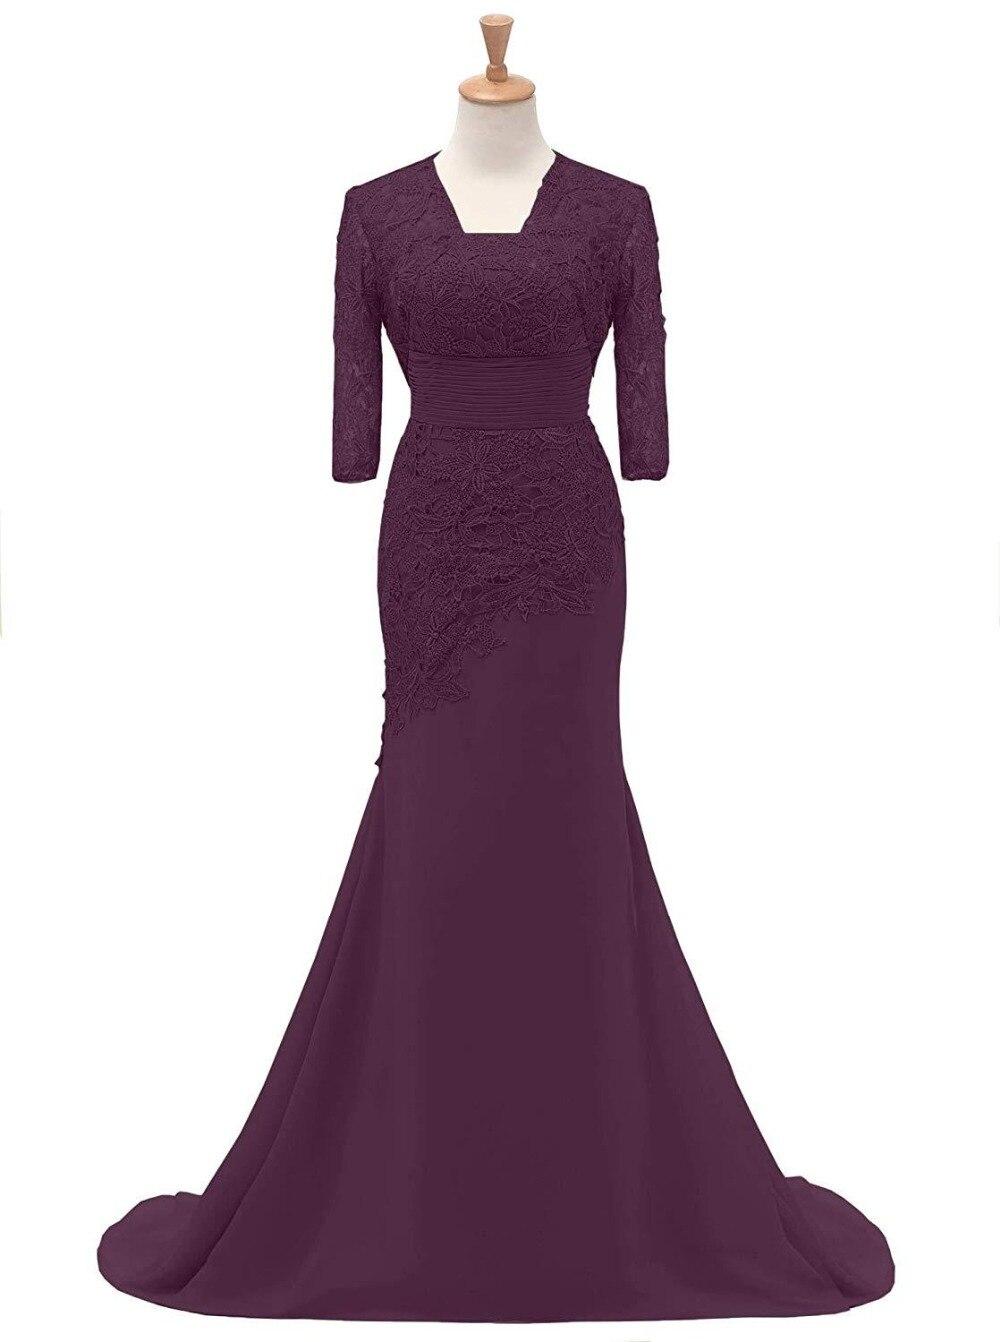 Vestido Novia Madrinha New Elegant 2 Piece Chiffon Lace Floor Length Evening Gown 2018 Mother Of The Bride Dresses With Jacket